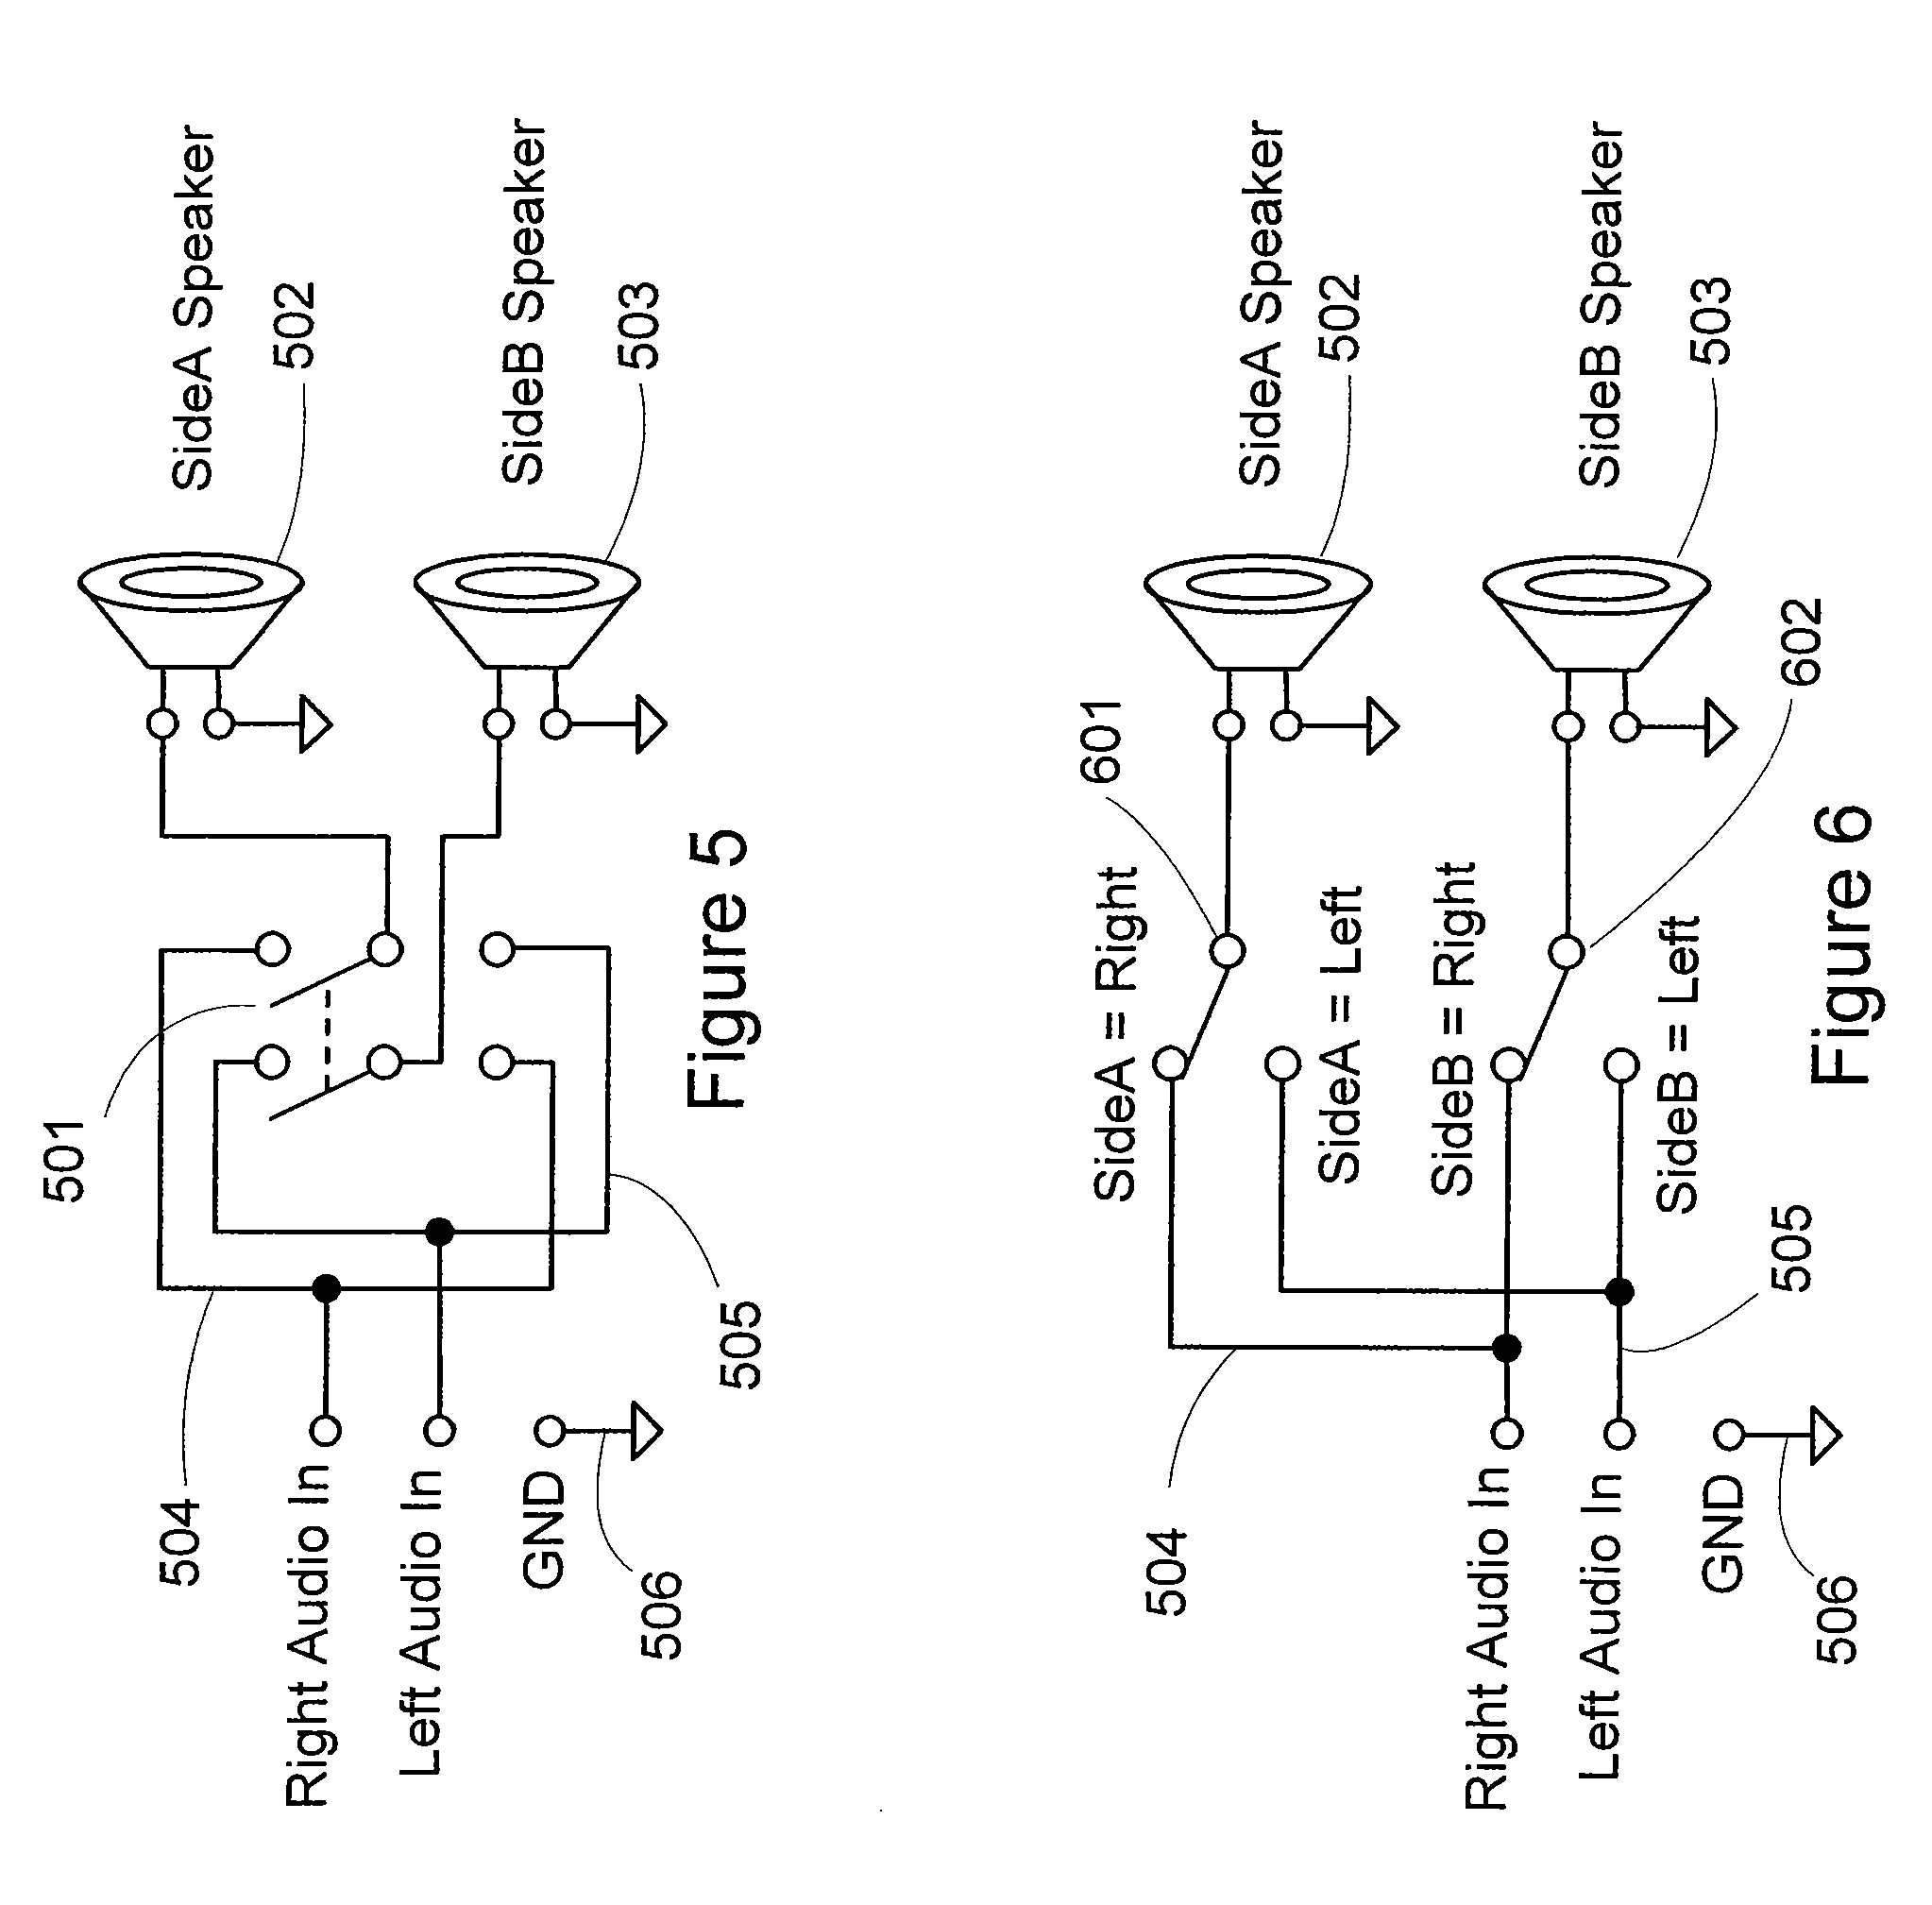 wiring diagram further 4 pin xlr connector wiring diagram wiring